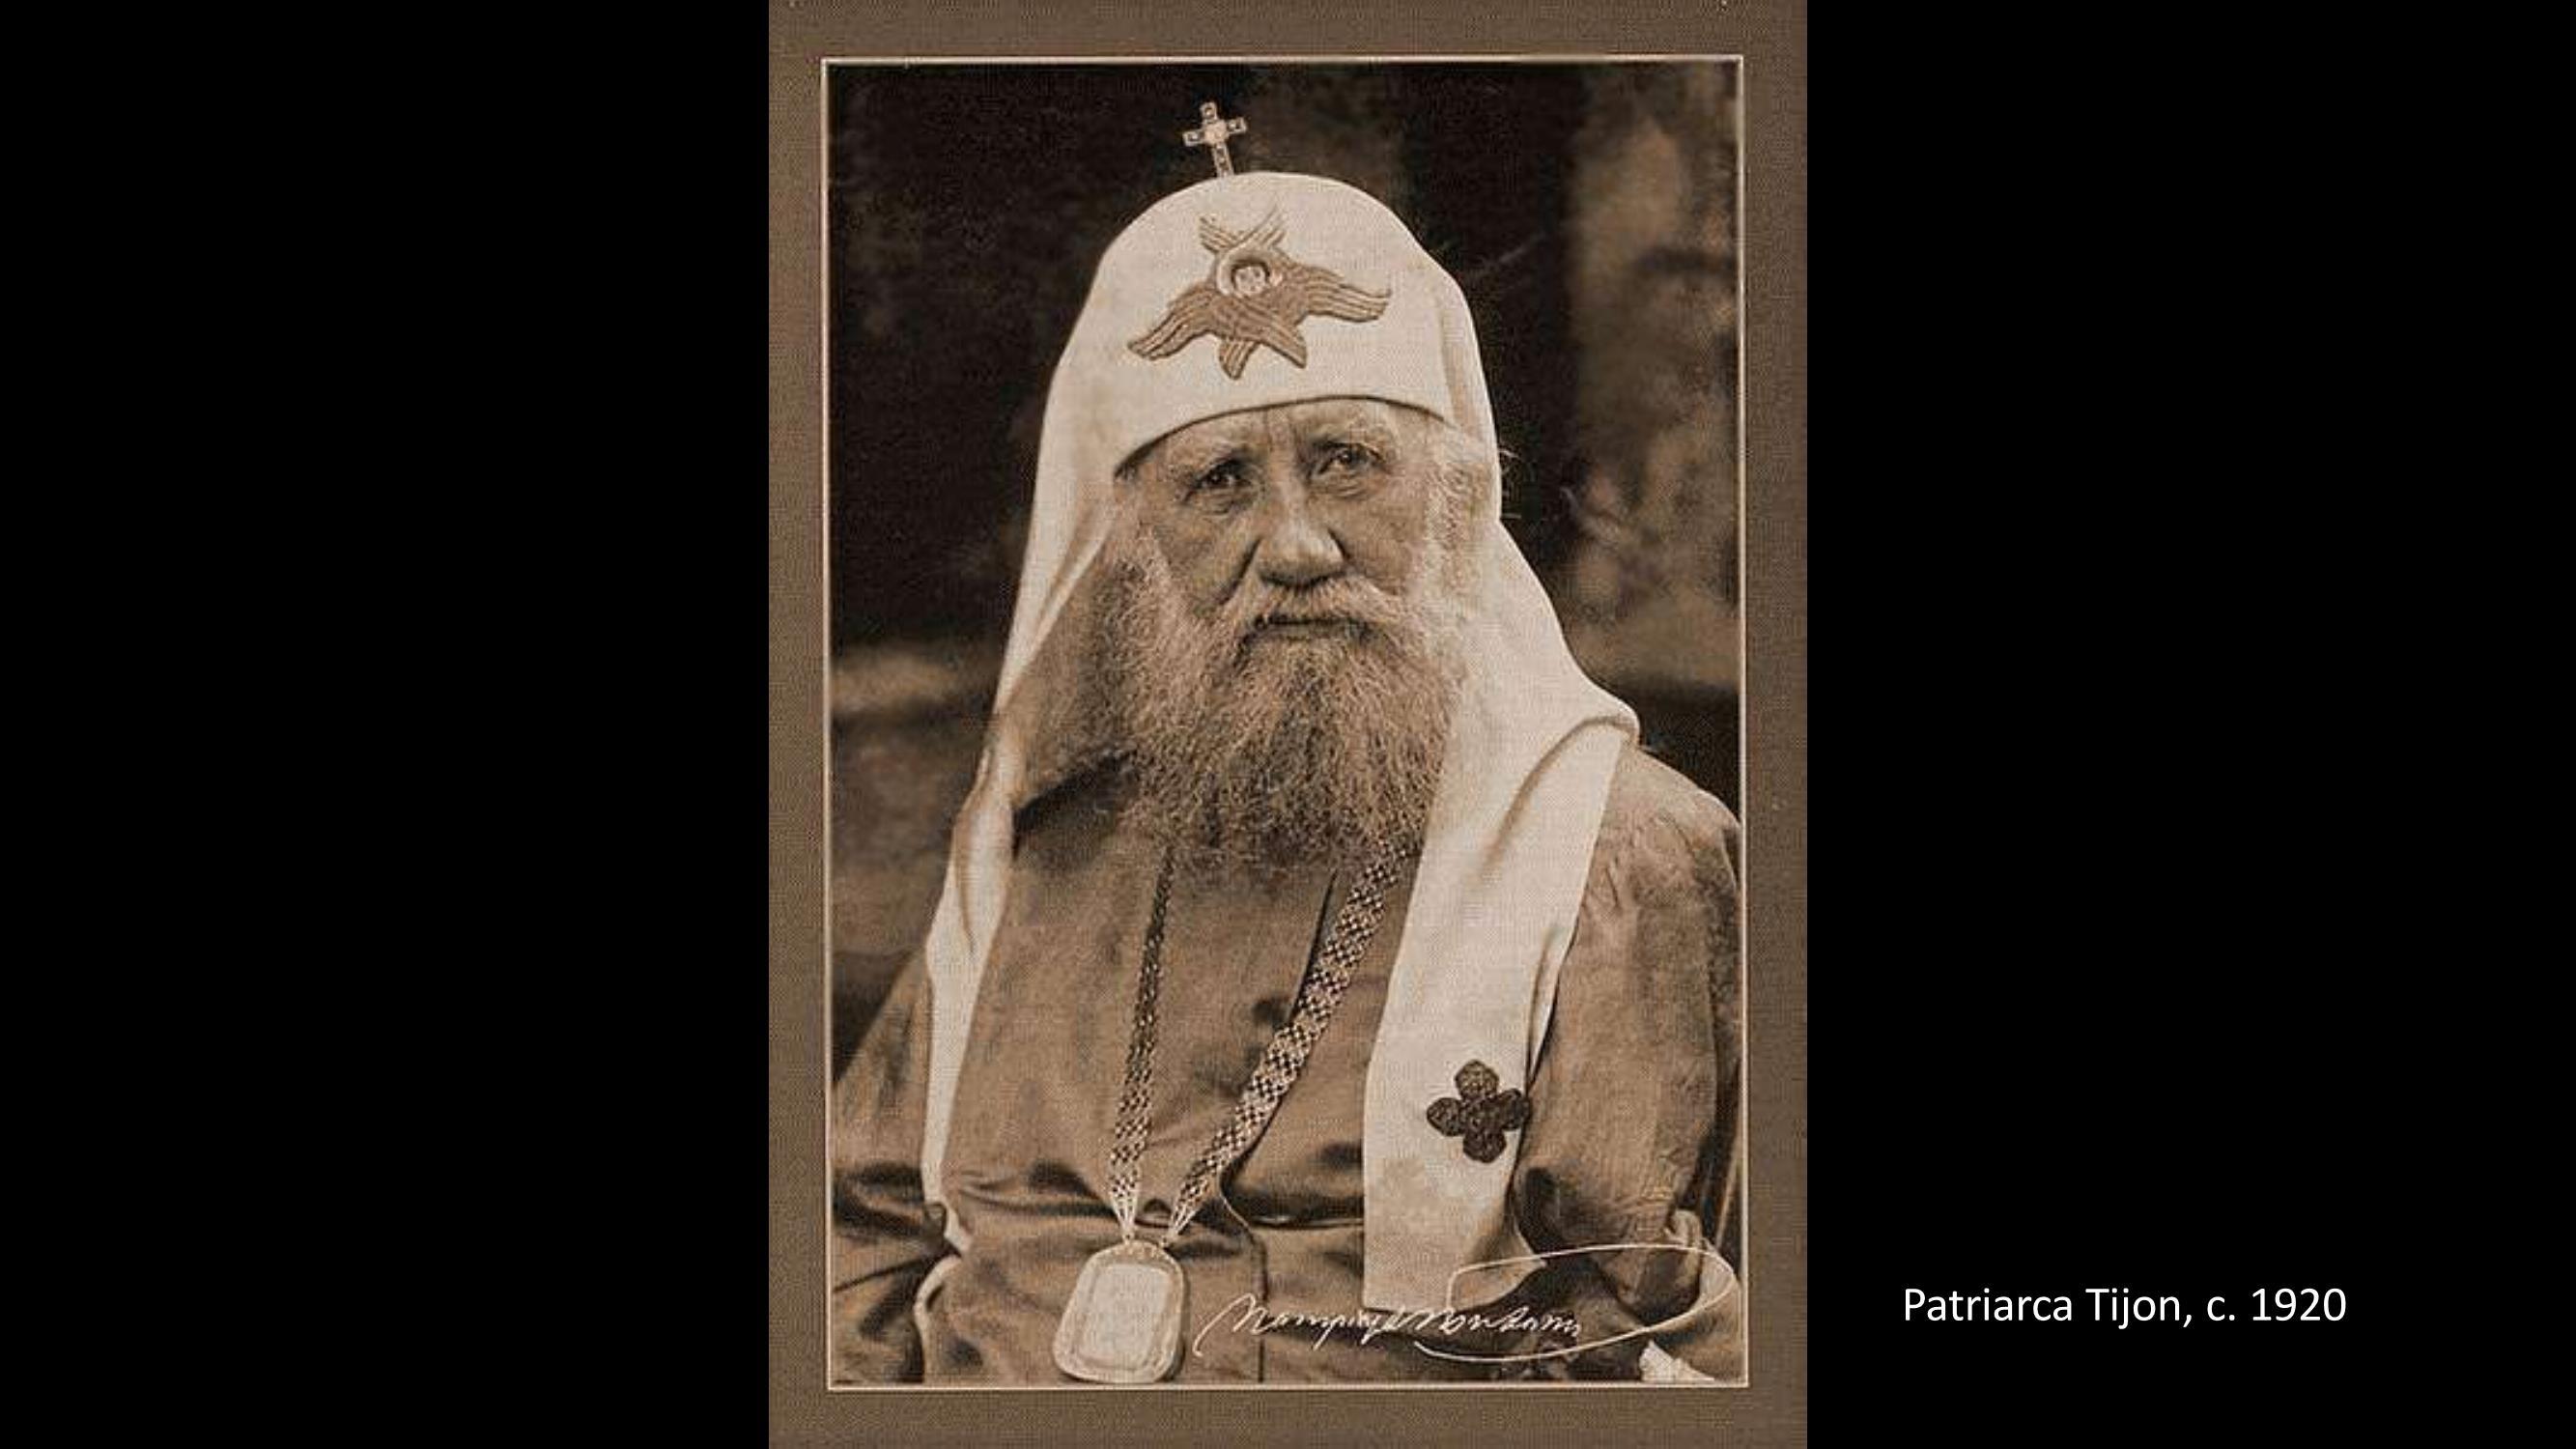 [33] Patriarca Tron, 1920